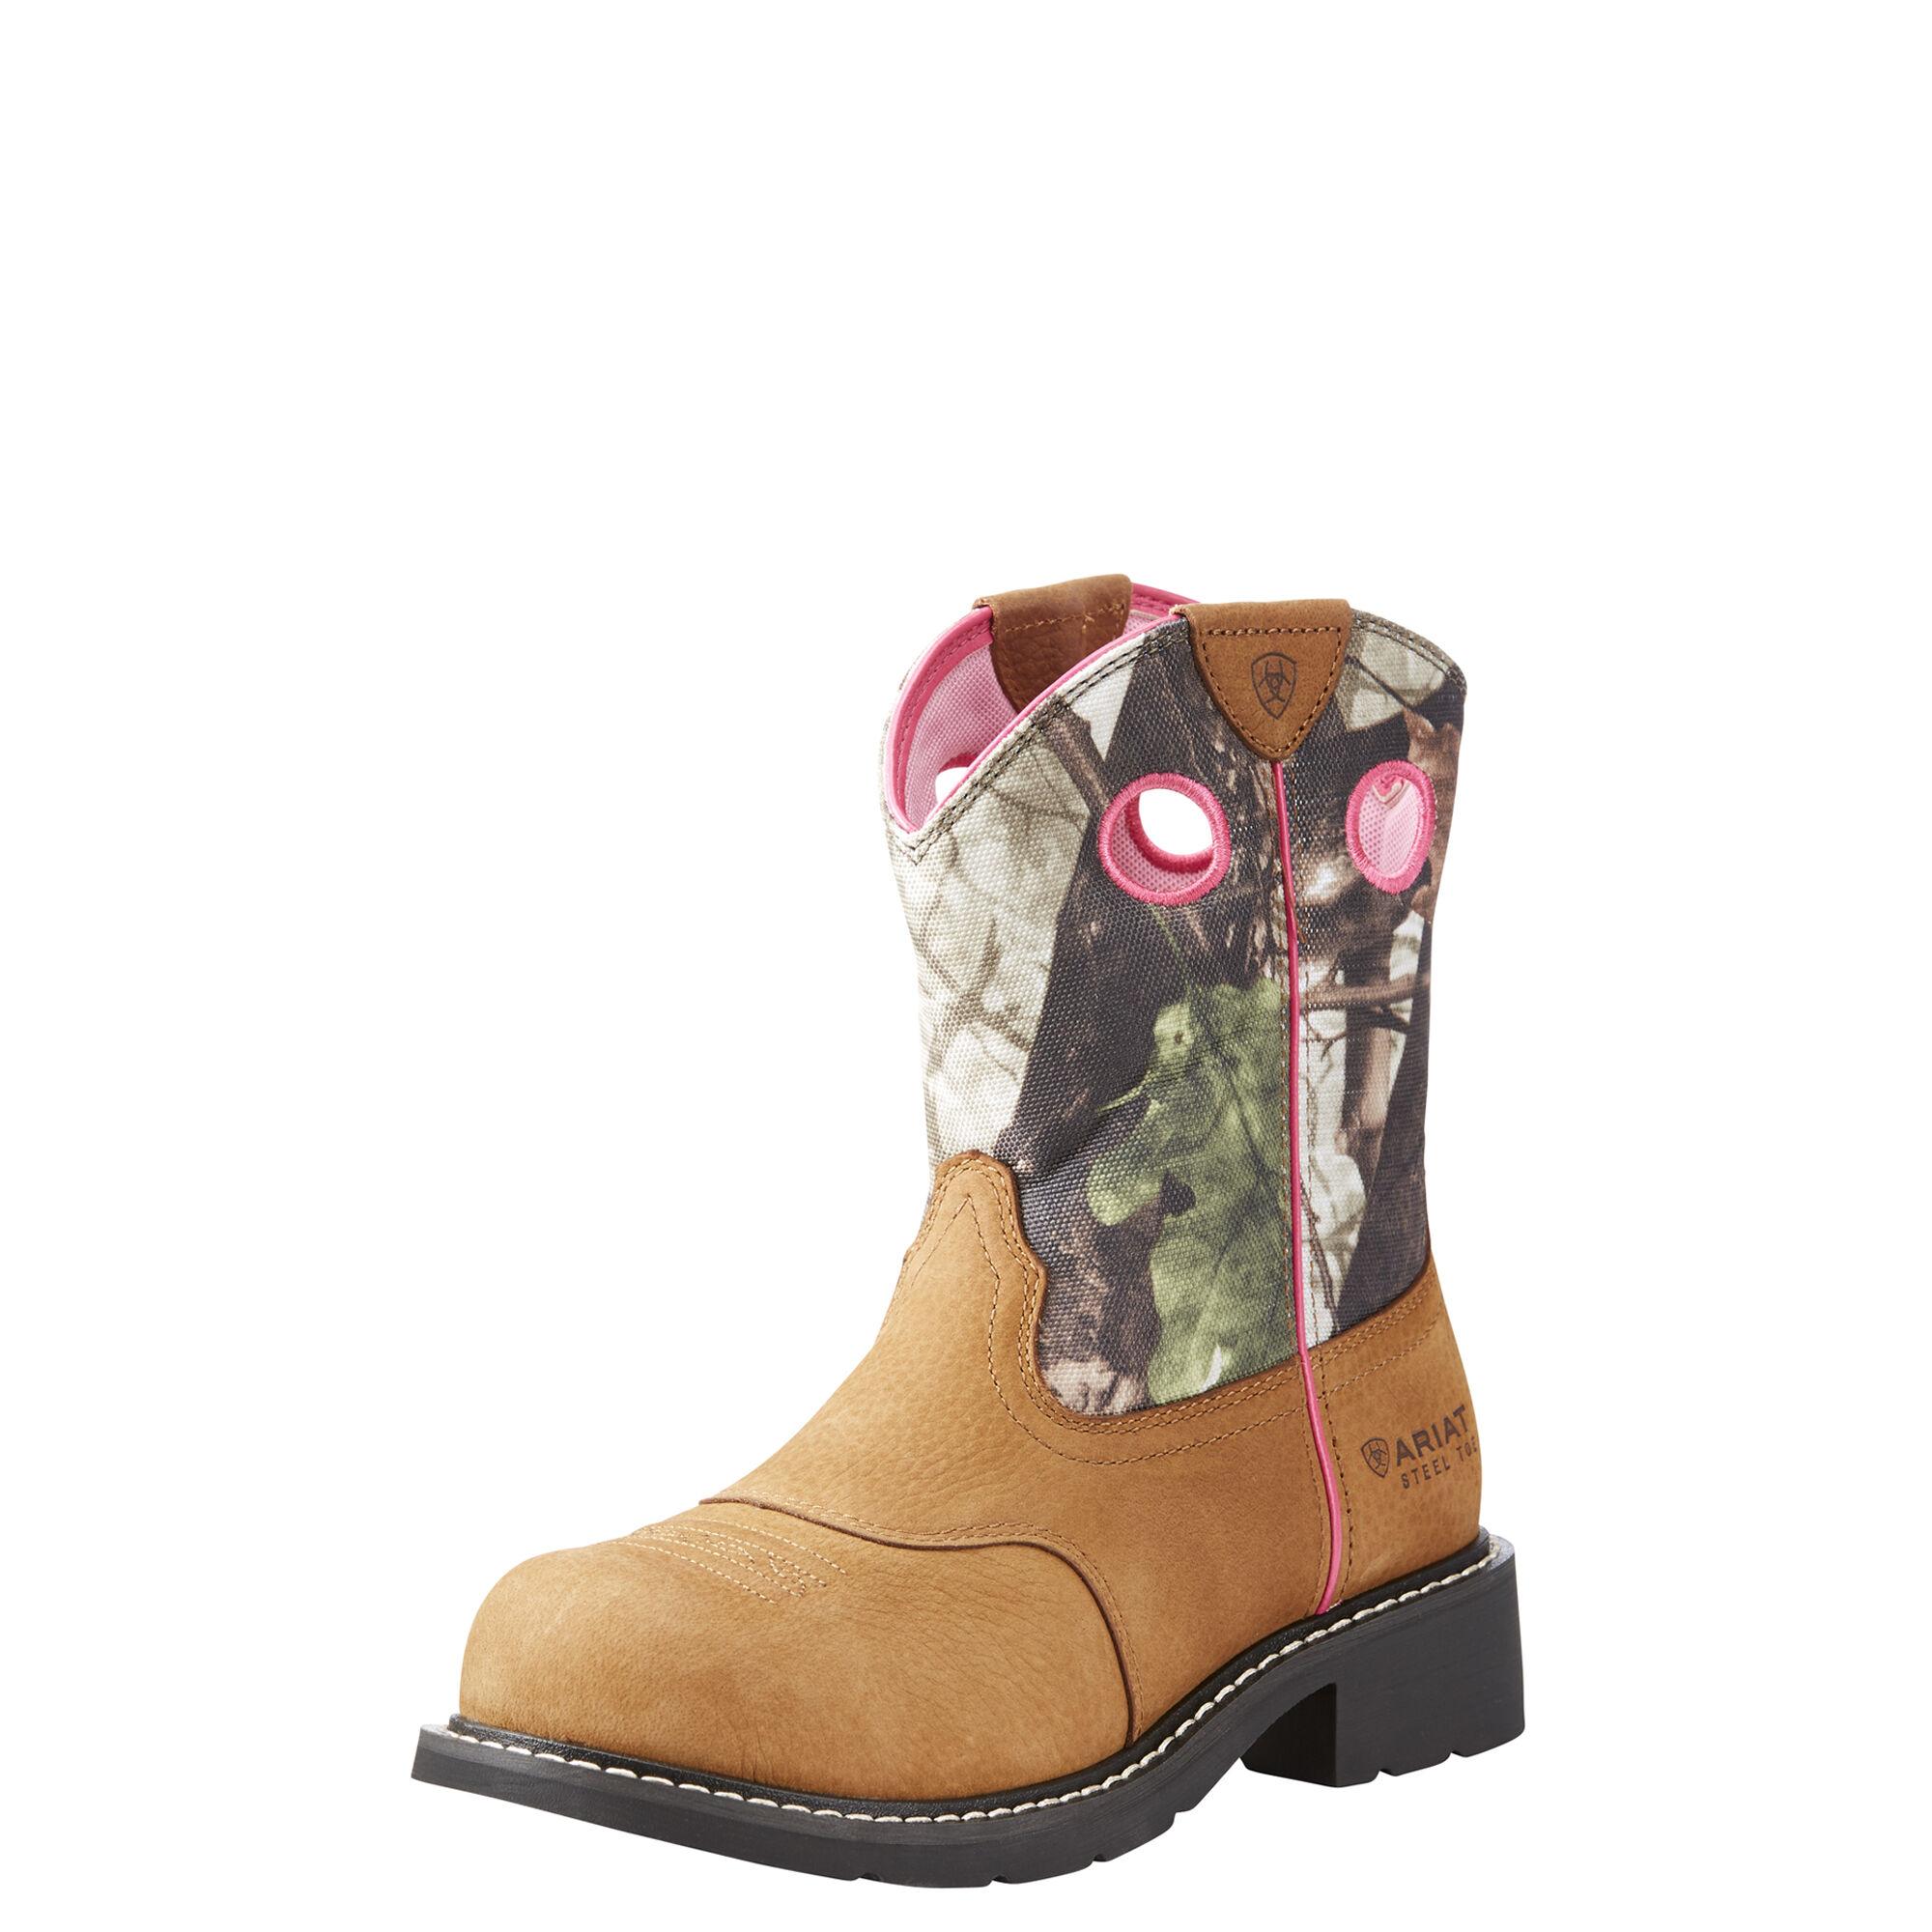 dbedb6055f8 Fatbaby Cowgirl Steel Toe Work Boot